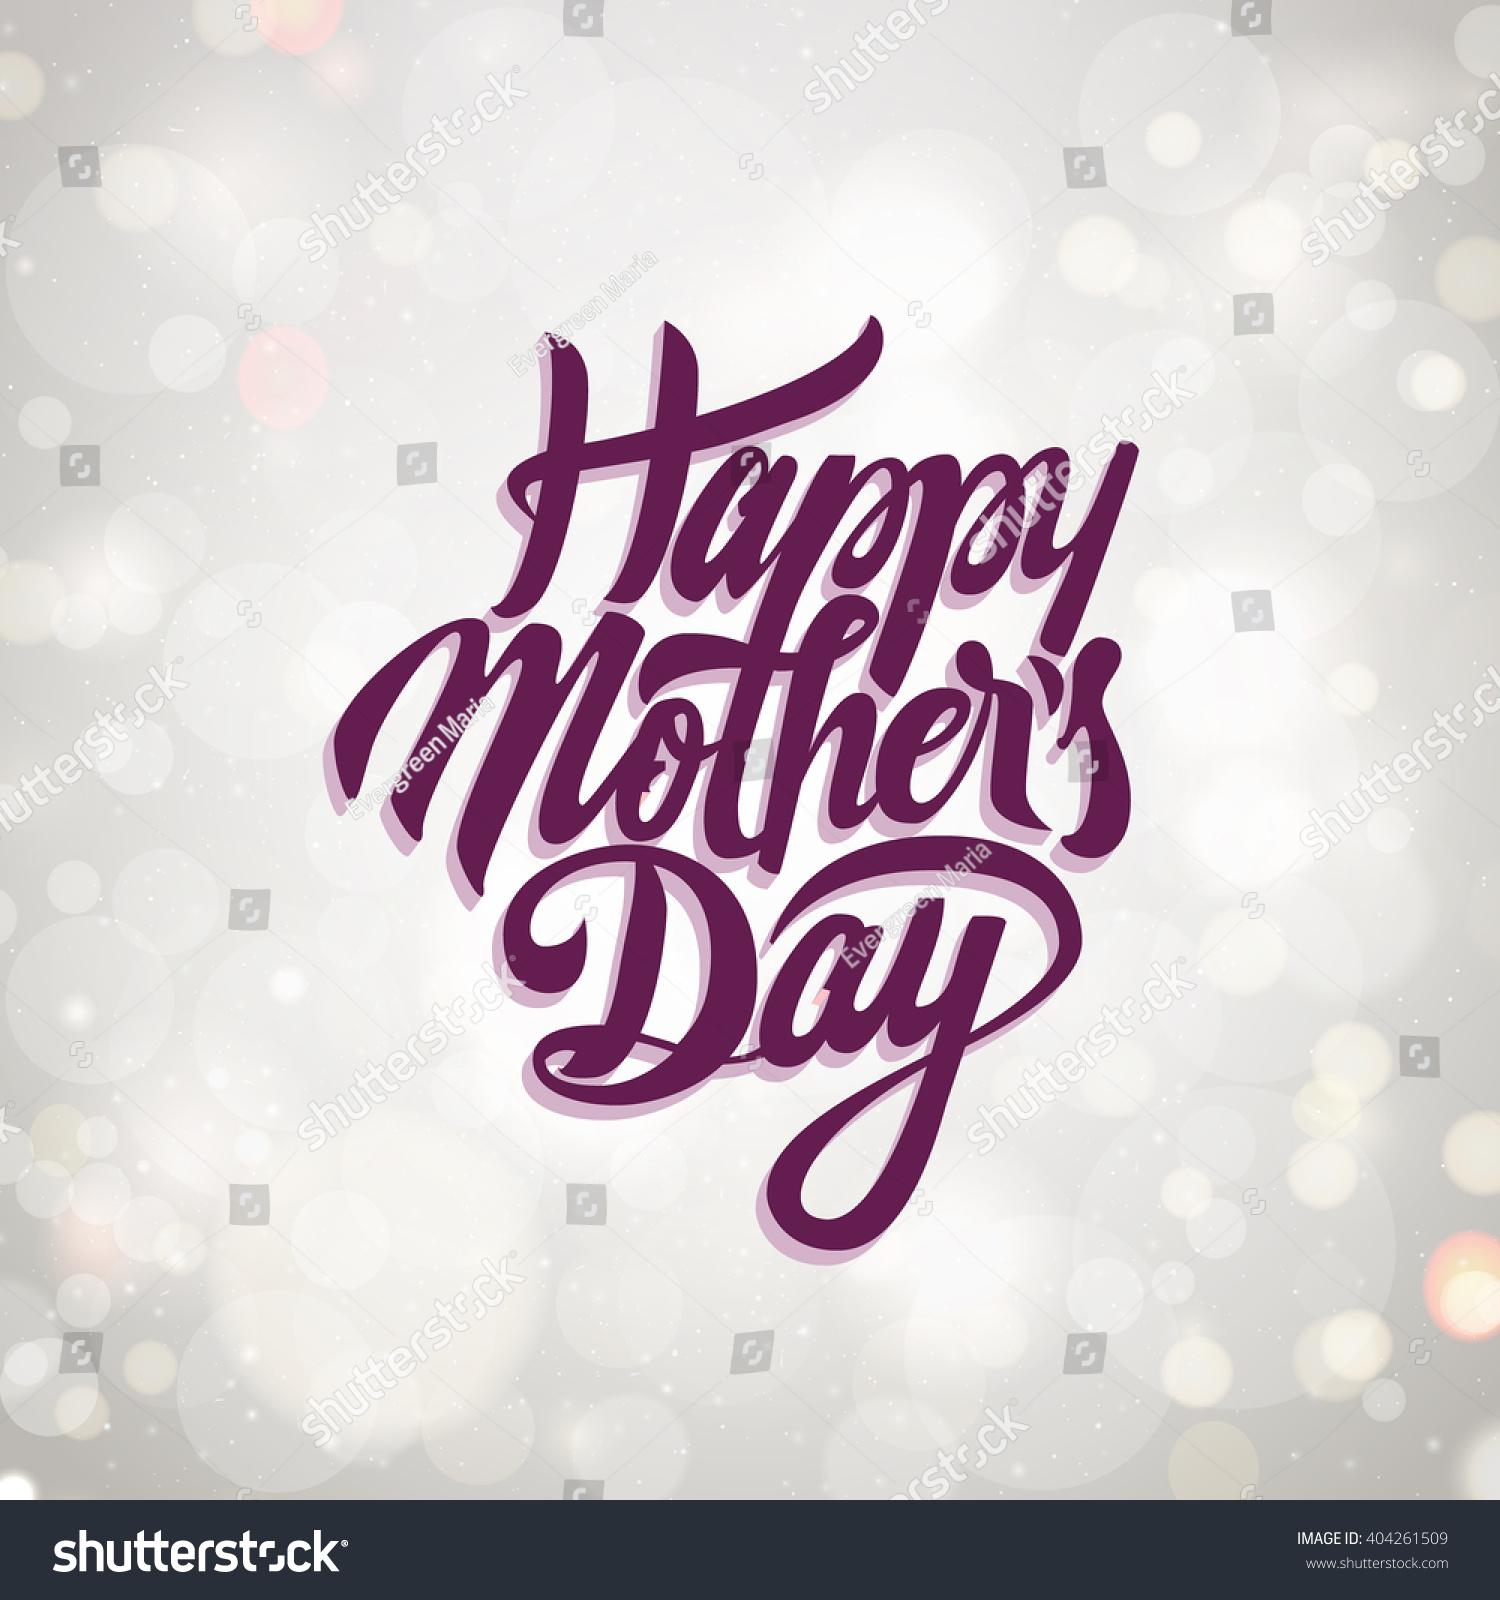 Happy Mothers Day Design Elements Vector Stock Vector 404261509 ...